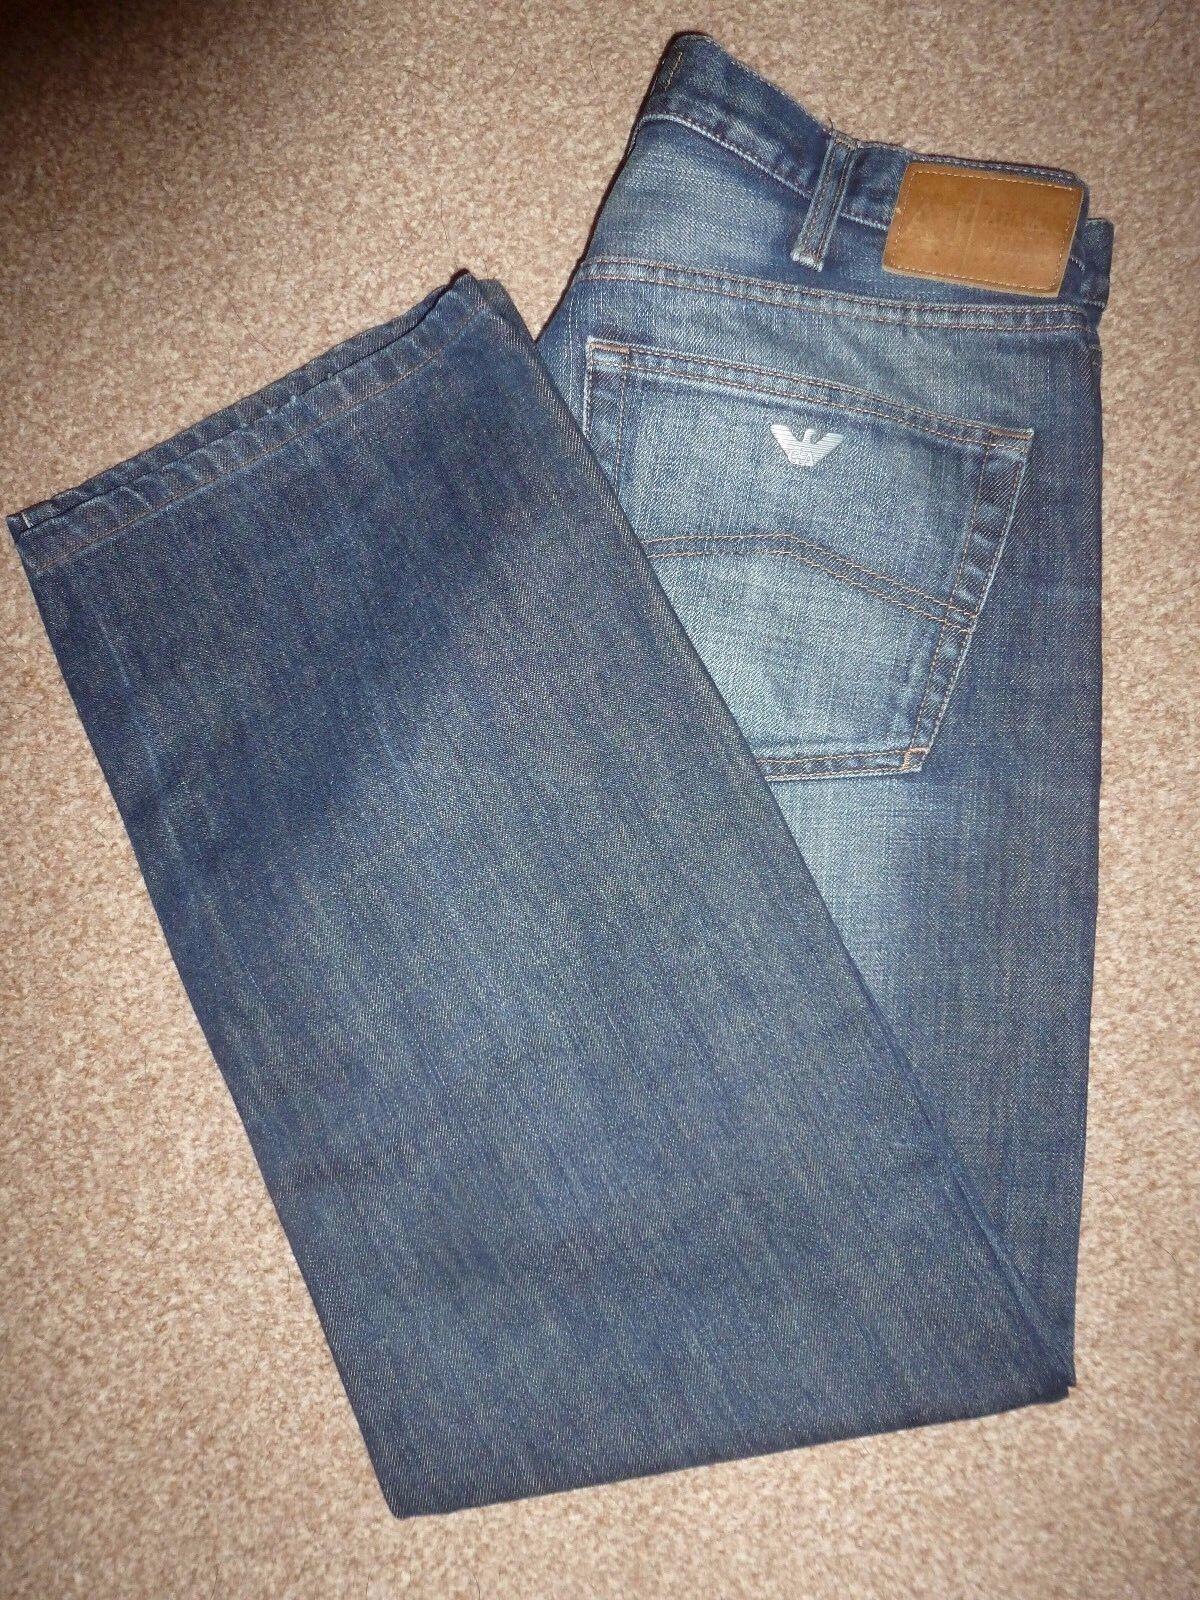 Da Uomo GA ARMANI JEANS AJ SERIE J07 Blu Denim Jeans Gamba Dritta Vita 32 Gamba 29